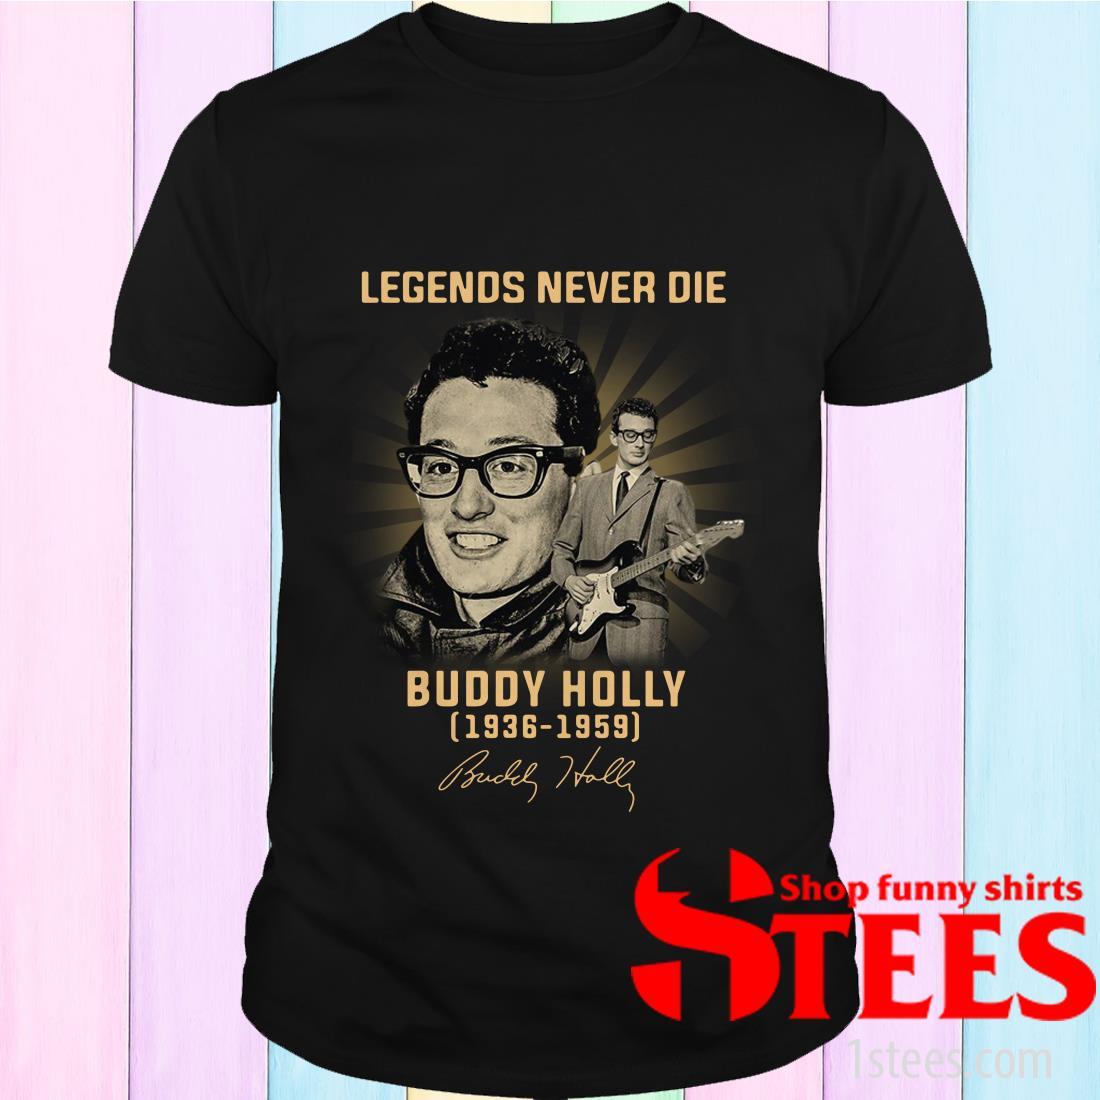 Buddy Holly Legends Never Die 1936 1959 Signature Shirt